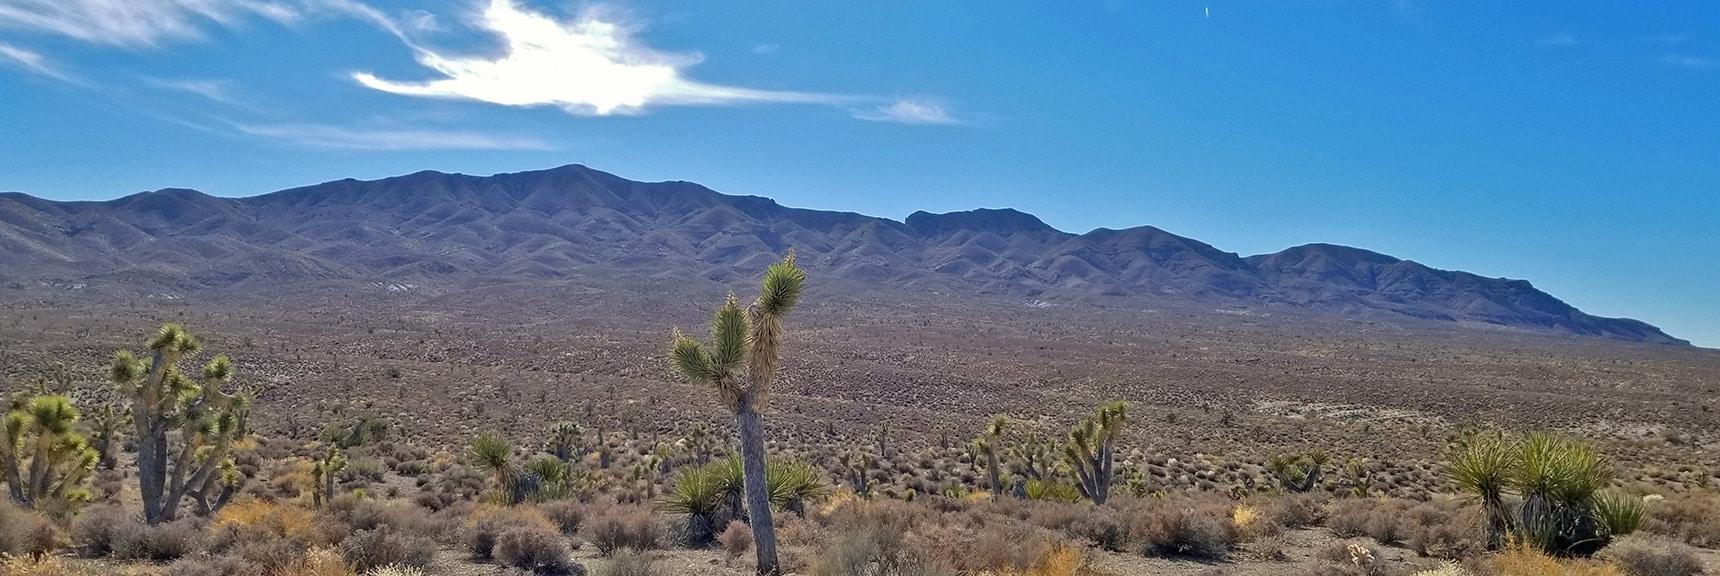 North Side of Gass Peak from Gass Peak Road | Gass Peak Road Circuit | Desert National Wildlife Refuge | Nevada